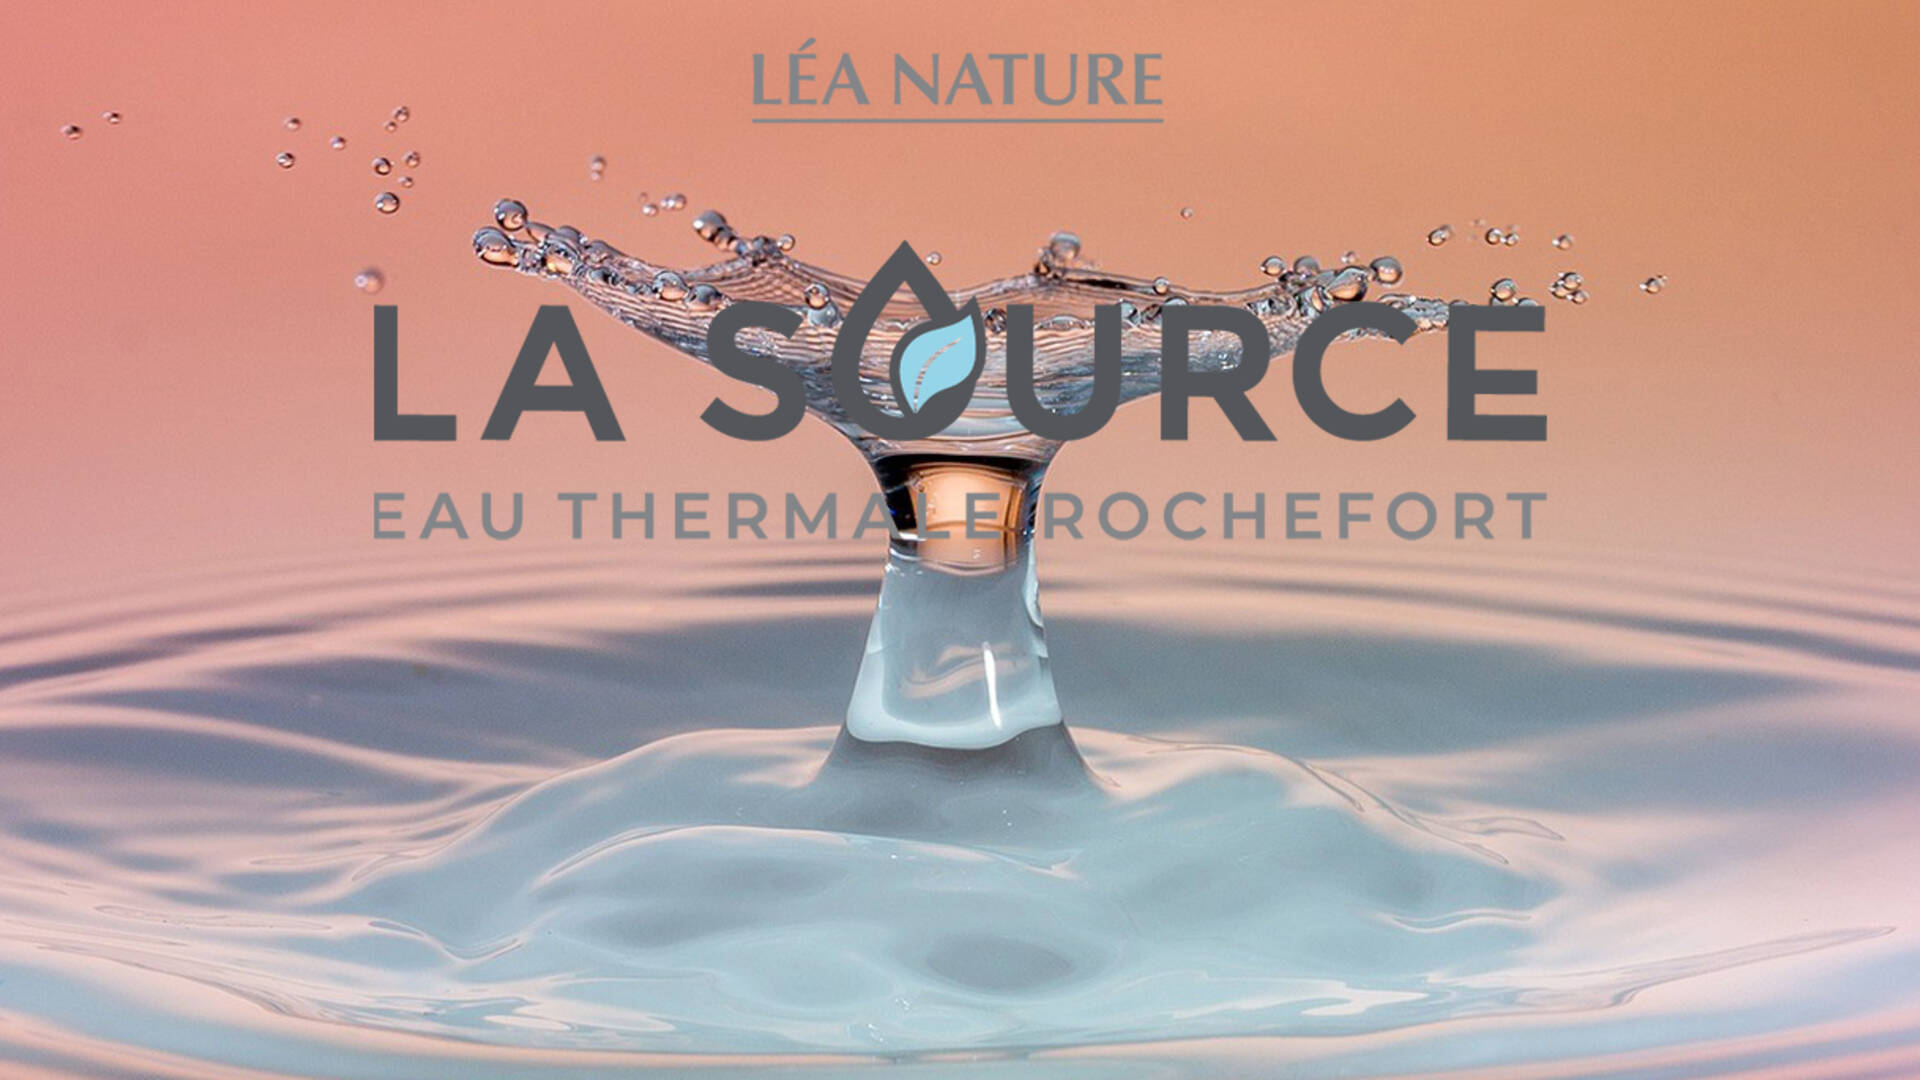 La Source Eau Thermale Rochefort®